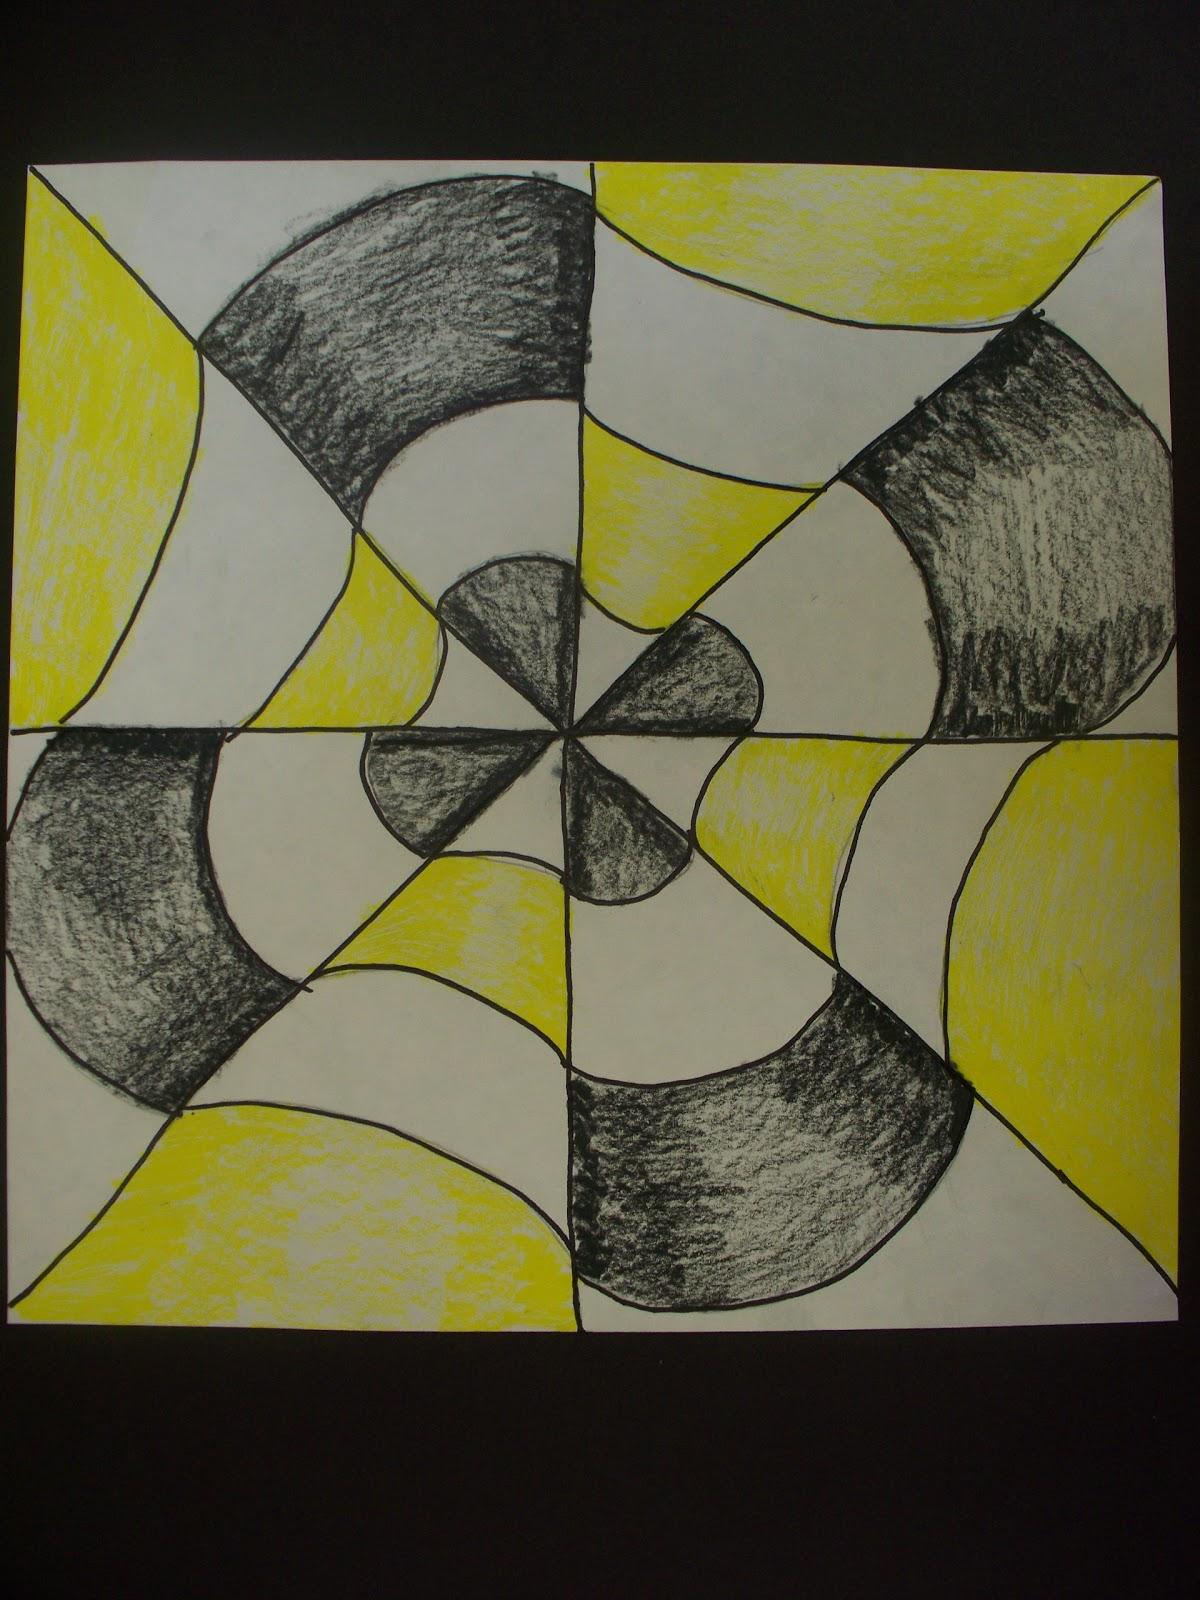 Drawn optical illusion optical design Optical Drawings Drawings Optical illusions